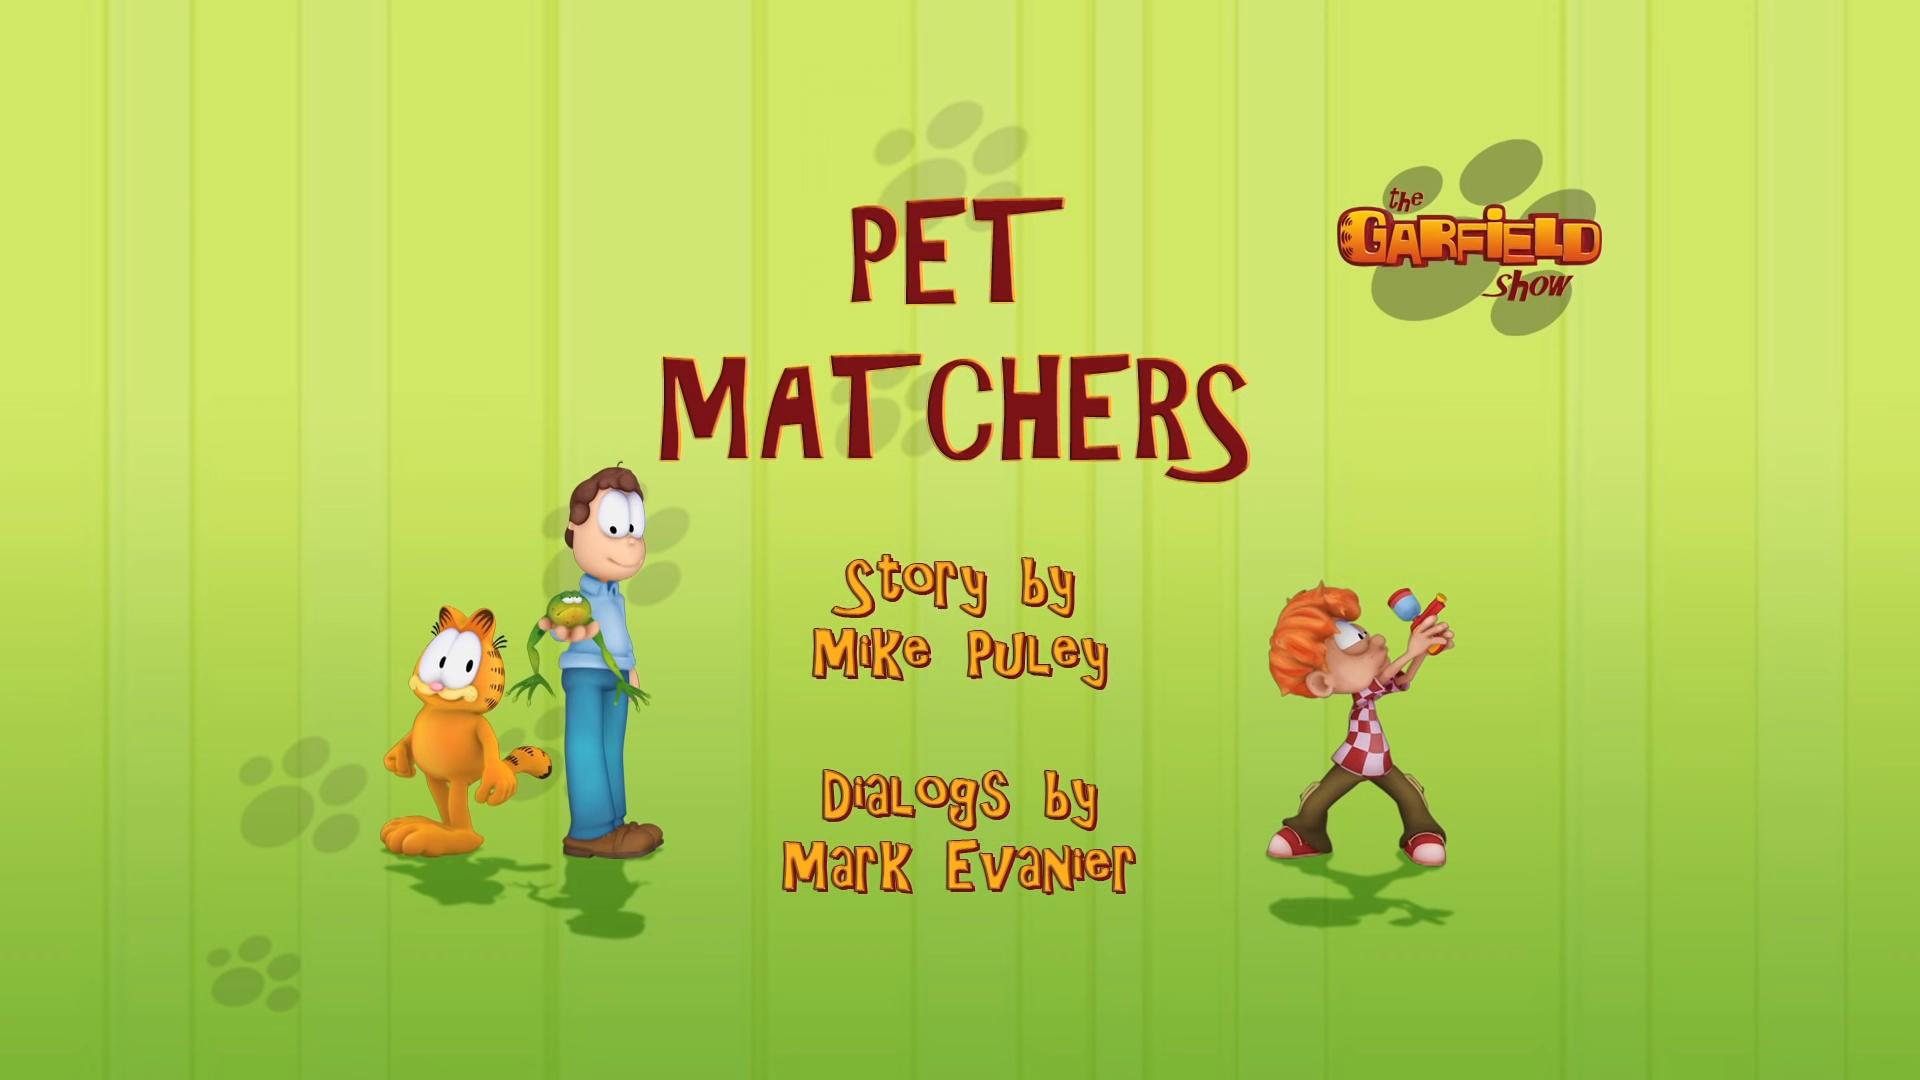 Pet Matchers